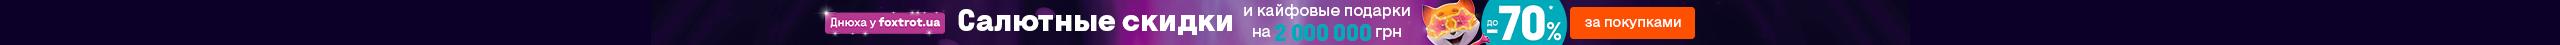 20210722_20210804_birthday_site_foxtrot_and_Foxy_superstar (header)